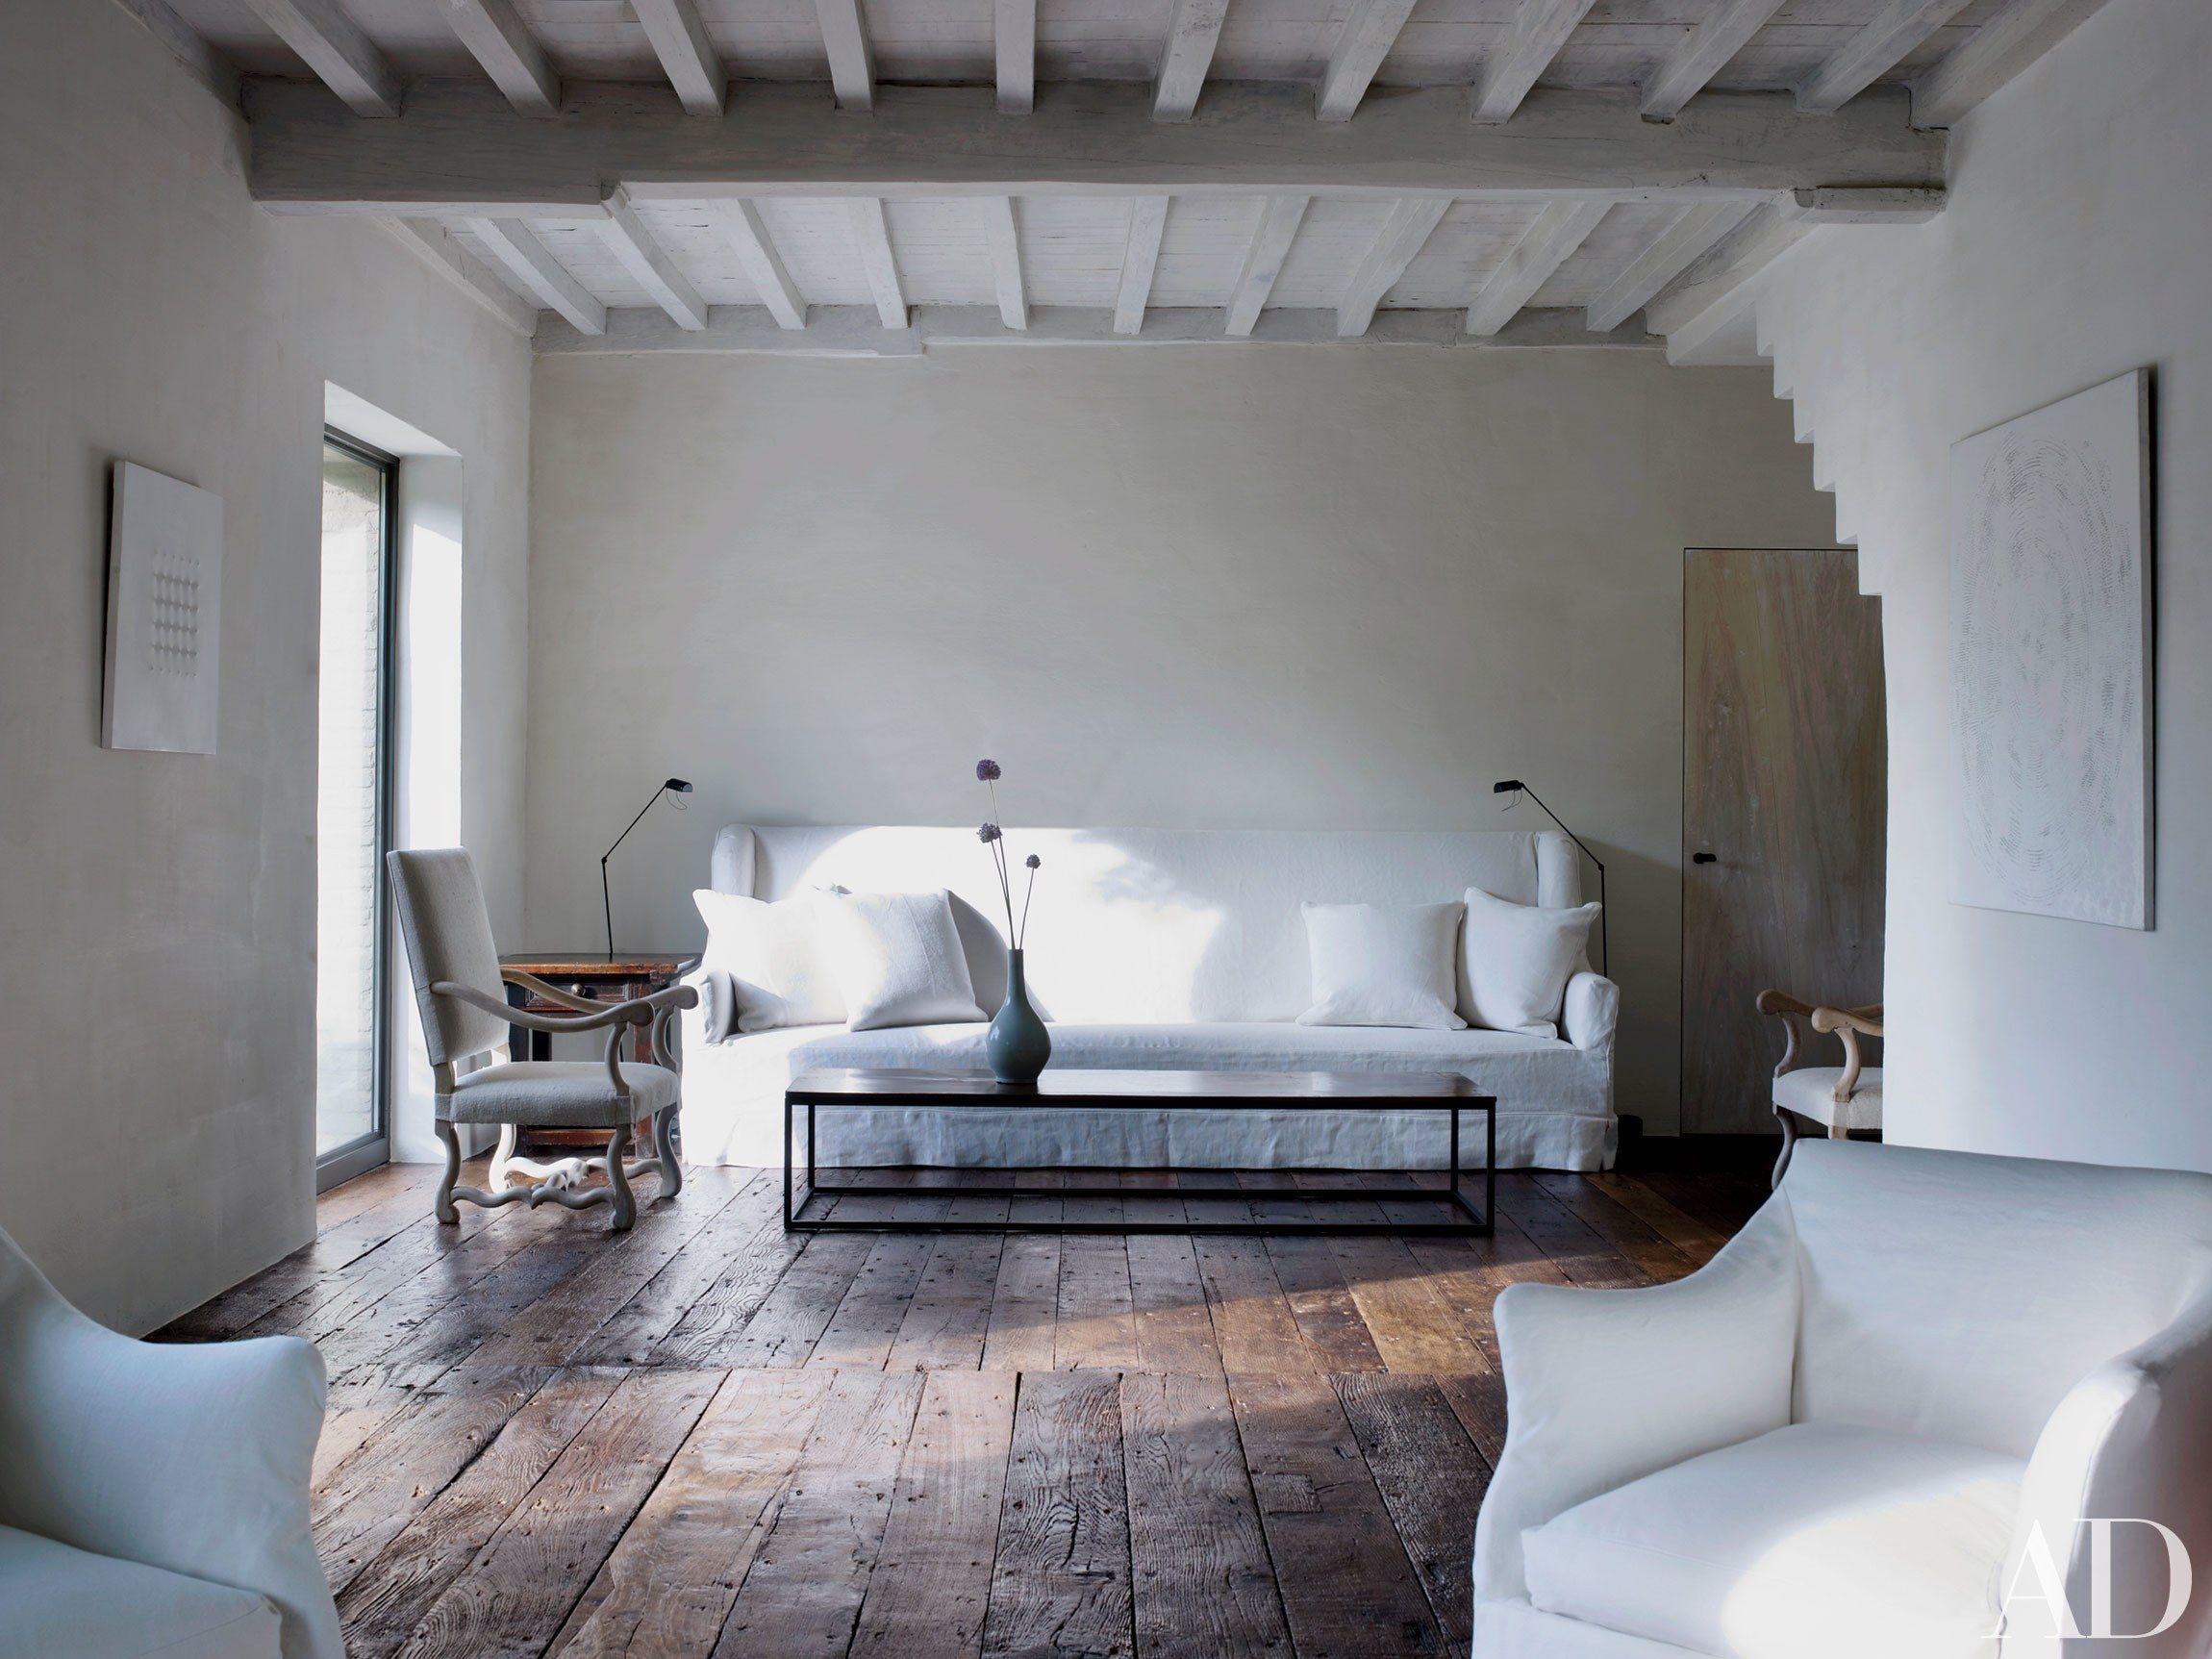 Elegant Interiors By Axel Vervoordt Home Rustic Living Room